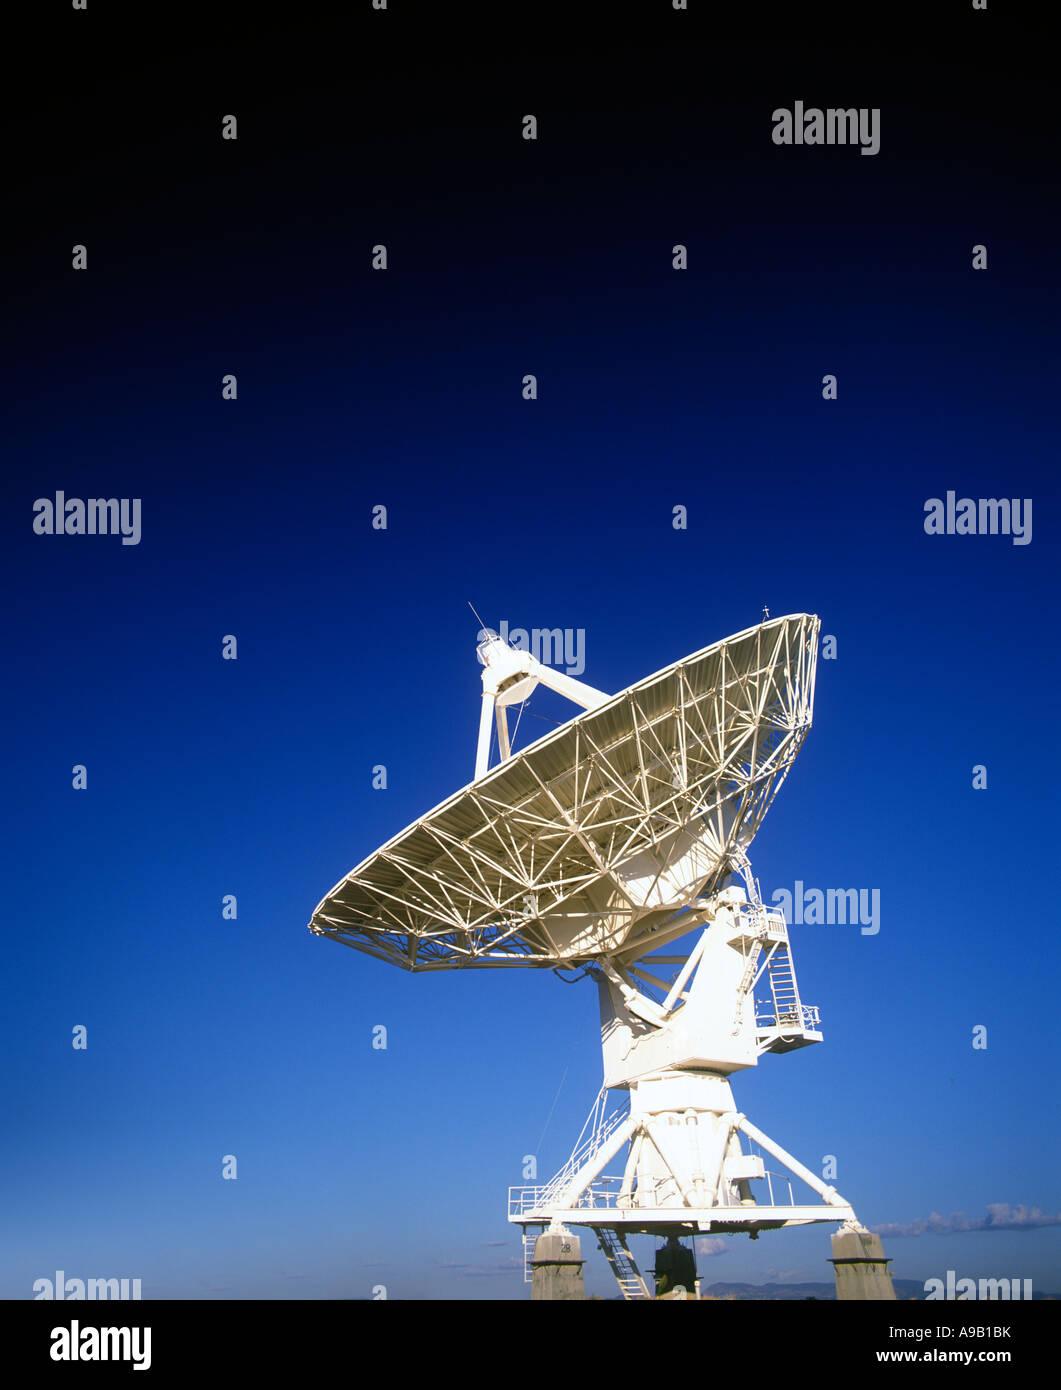 ROW OF SATELLITE DISHES JANSKY VLART RADIO TELESCOPE ARRAY PLAINS OF SAINT AUGUSTINE NEW MEXICO USA Stock Photo